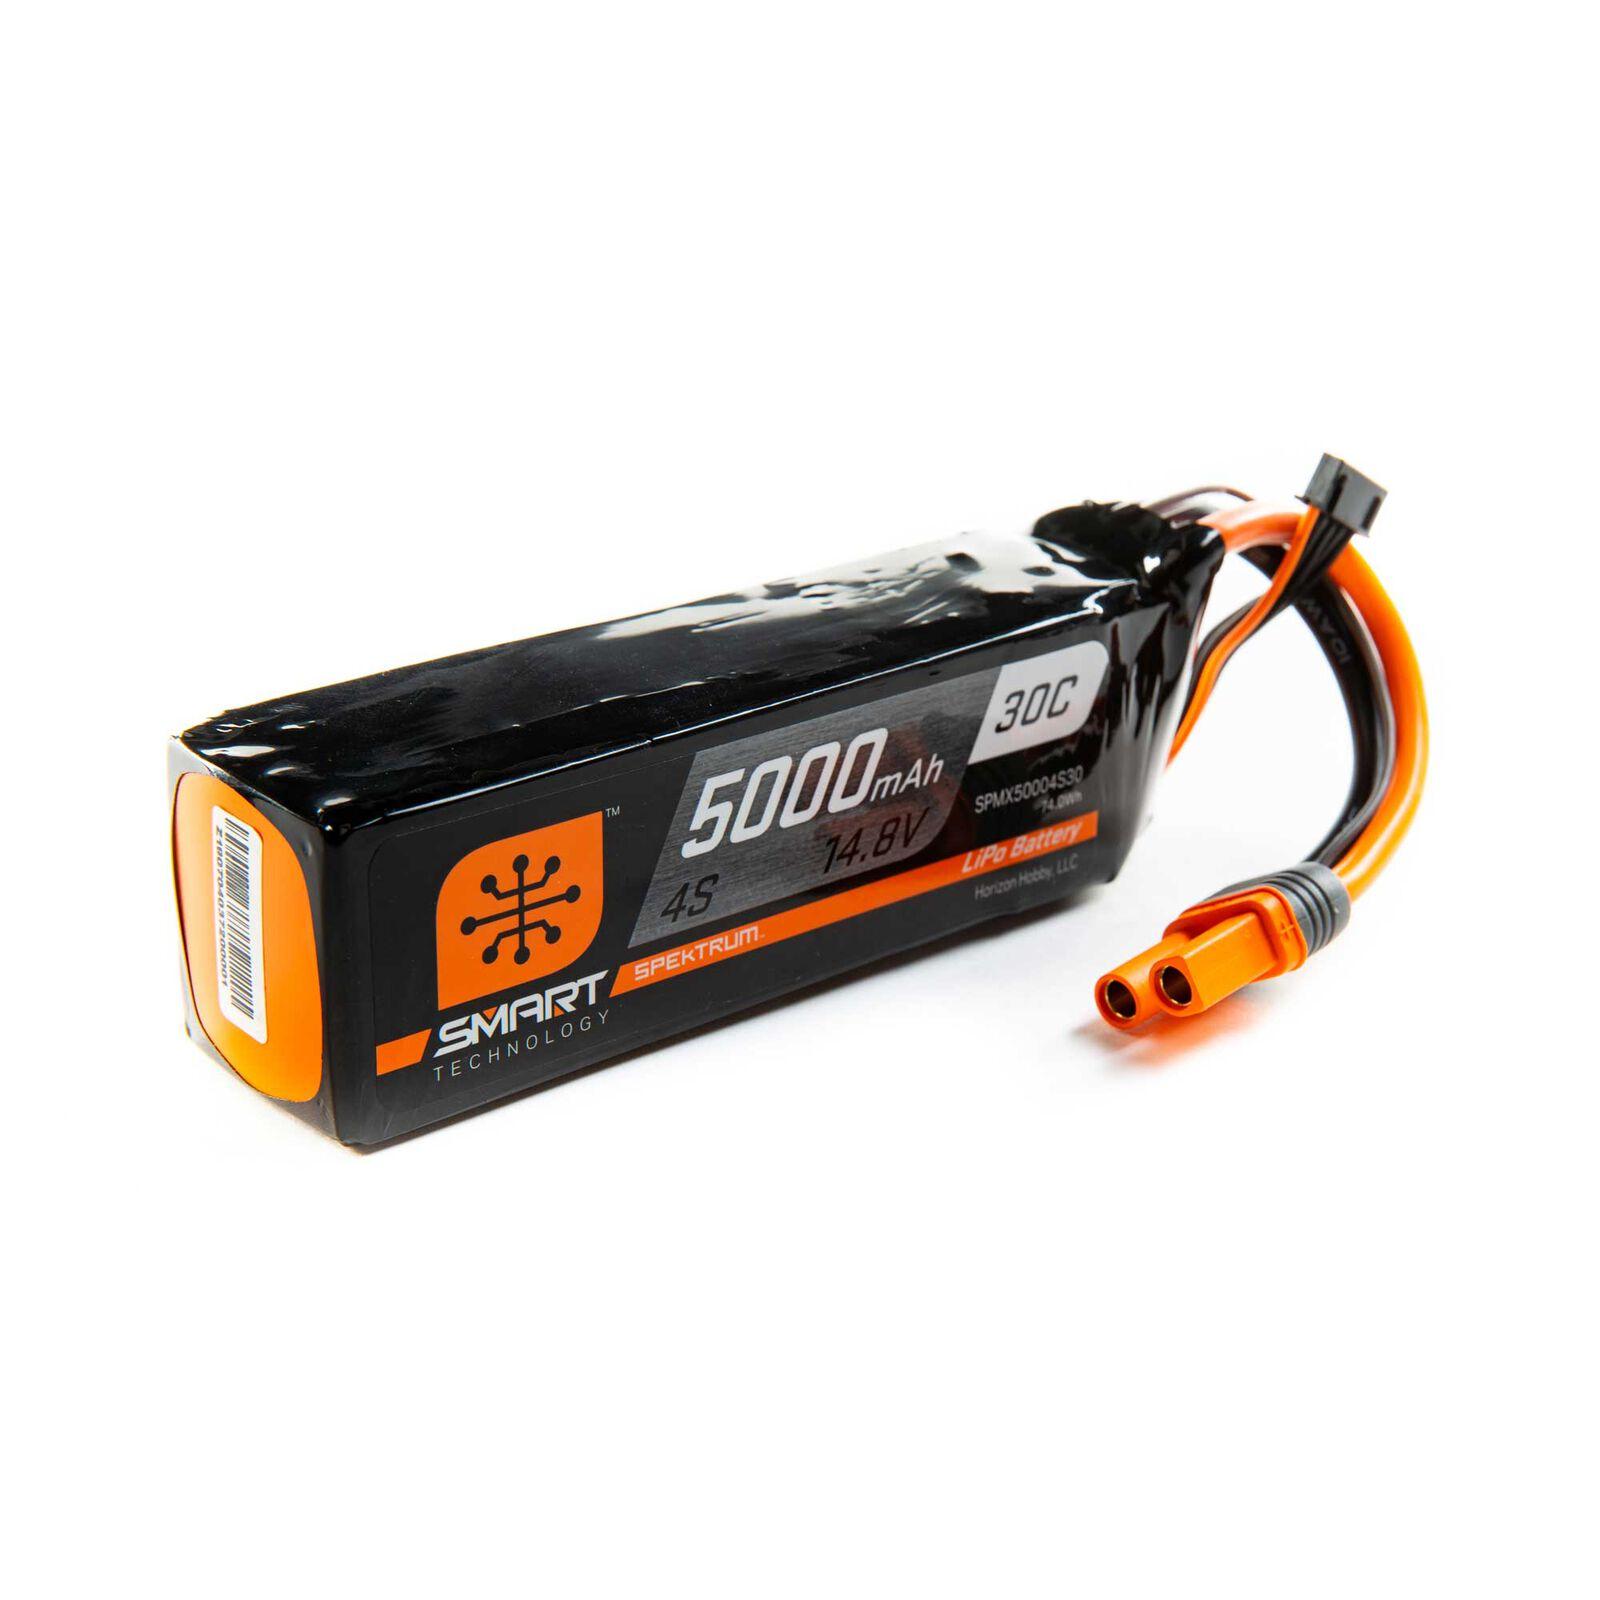 14.8V 5000mAh 4S 30C Smart LiPo Battery: IC5